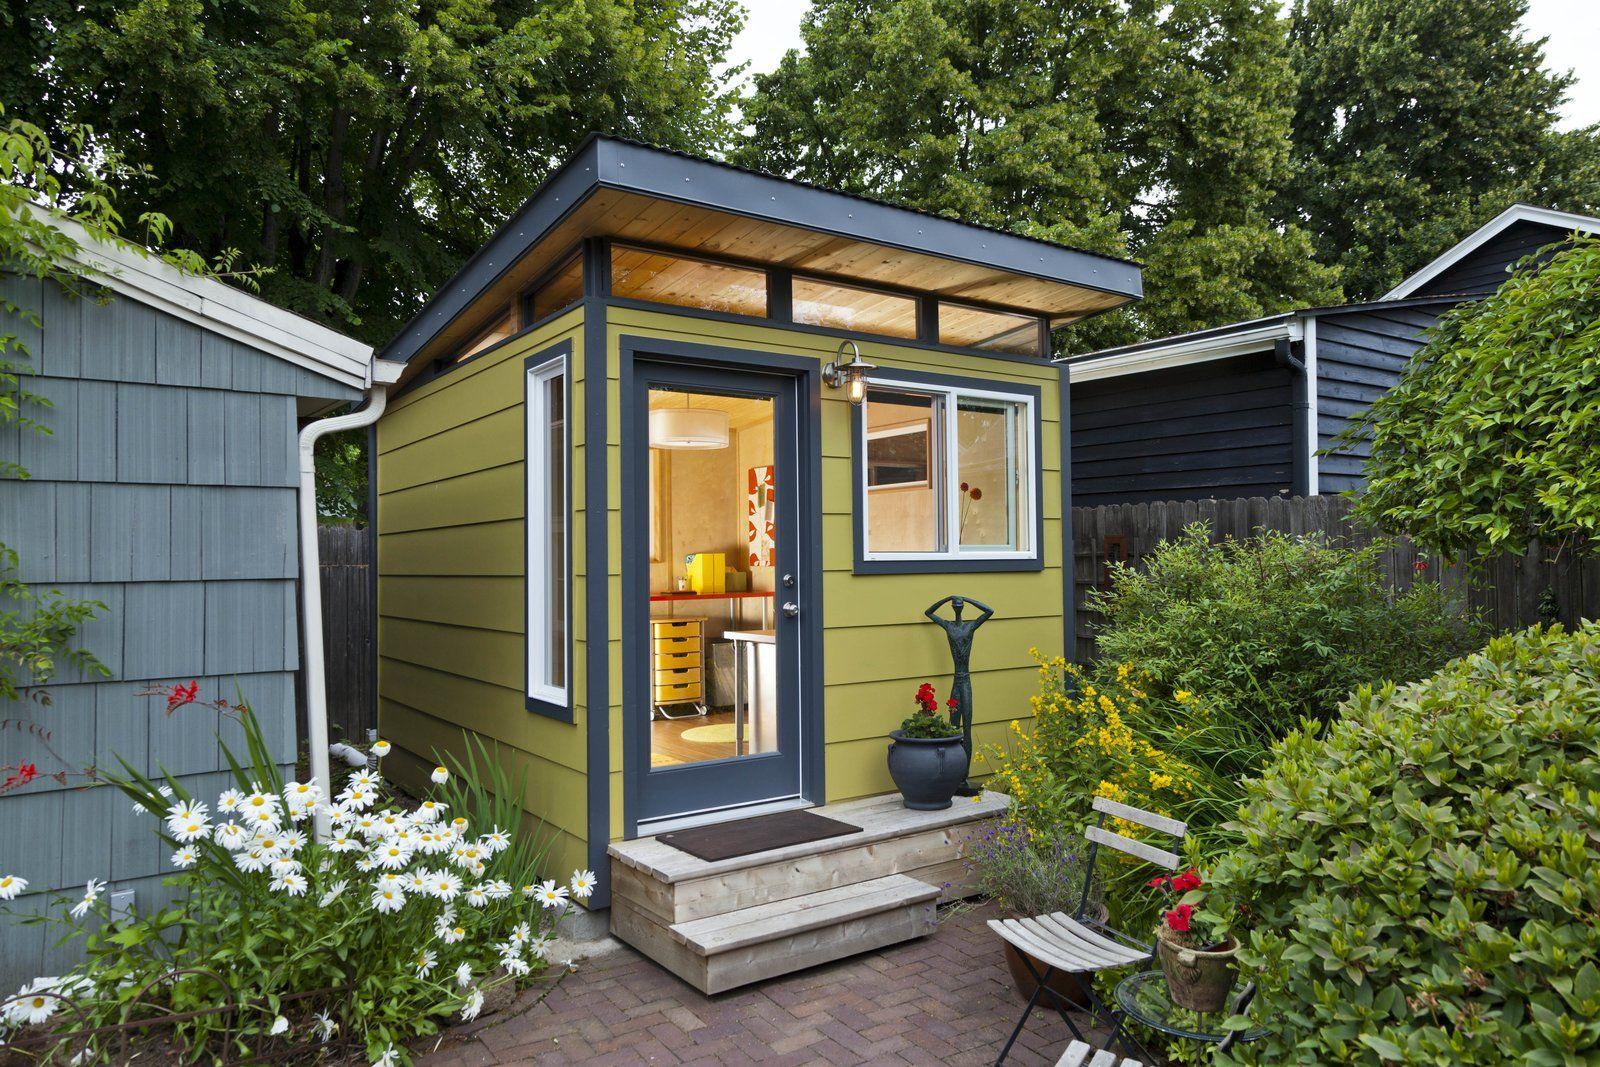 Modern She Shed Designs And Ideas Shed Design She Shed Decorating Ideas Backyard Storage Sheds